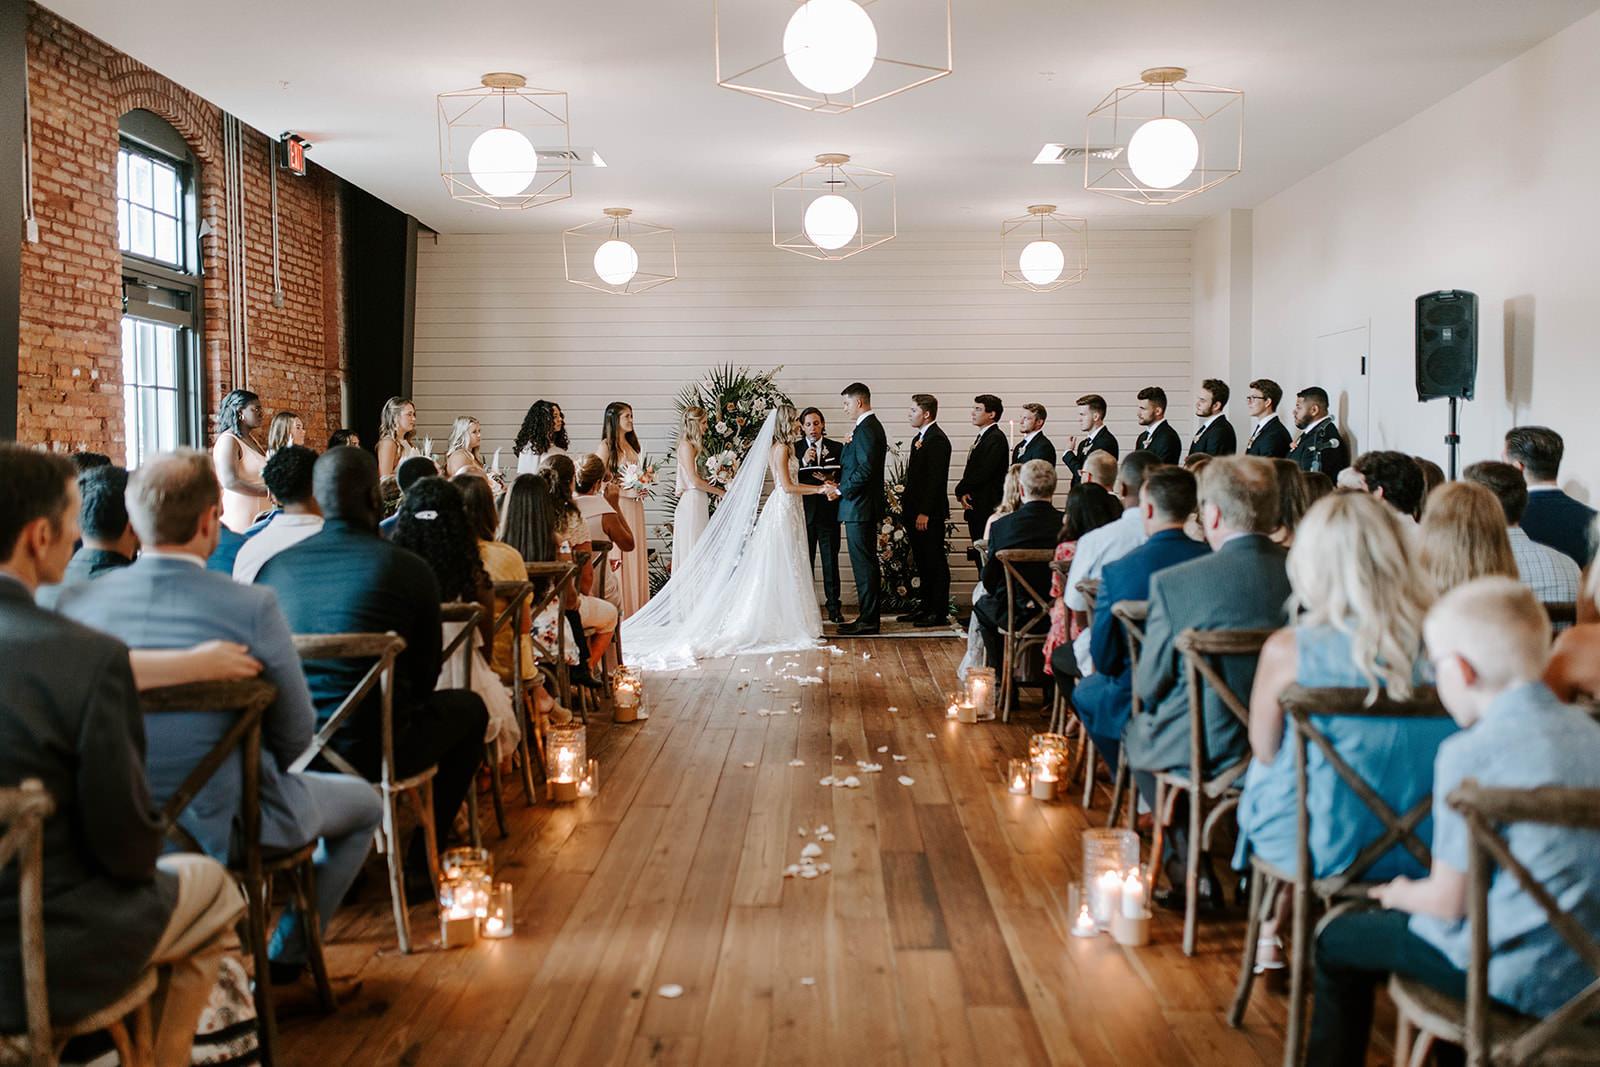 Boho Whimsical Wedding Ceremony Bride and Groom Exchanging Wedding Vows Portrait   Industrial Tampa Bay Wedding Venue Armature Works   Tampa Bay Wedding Planner Coastal Coordinating